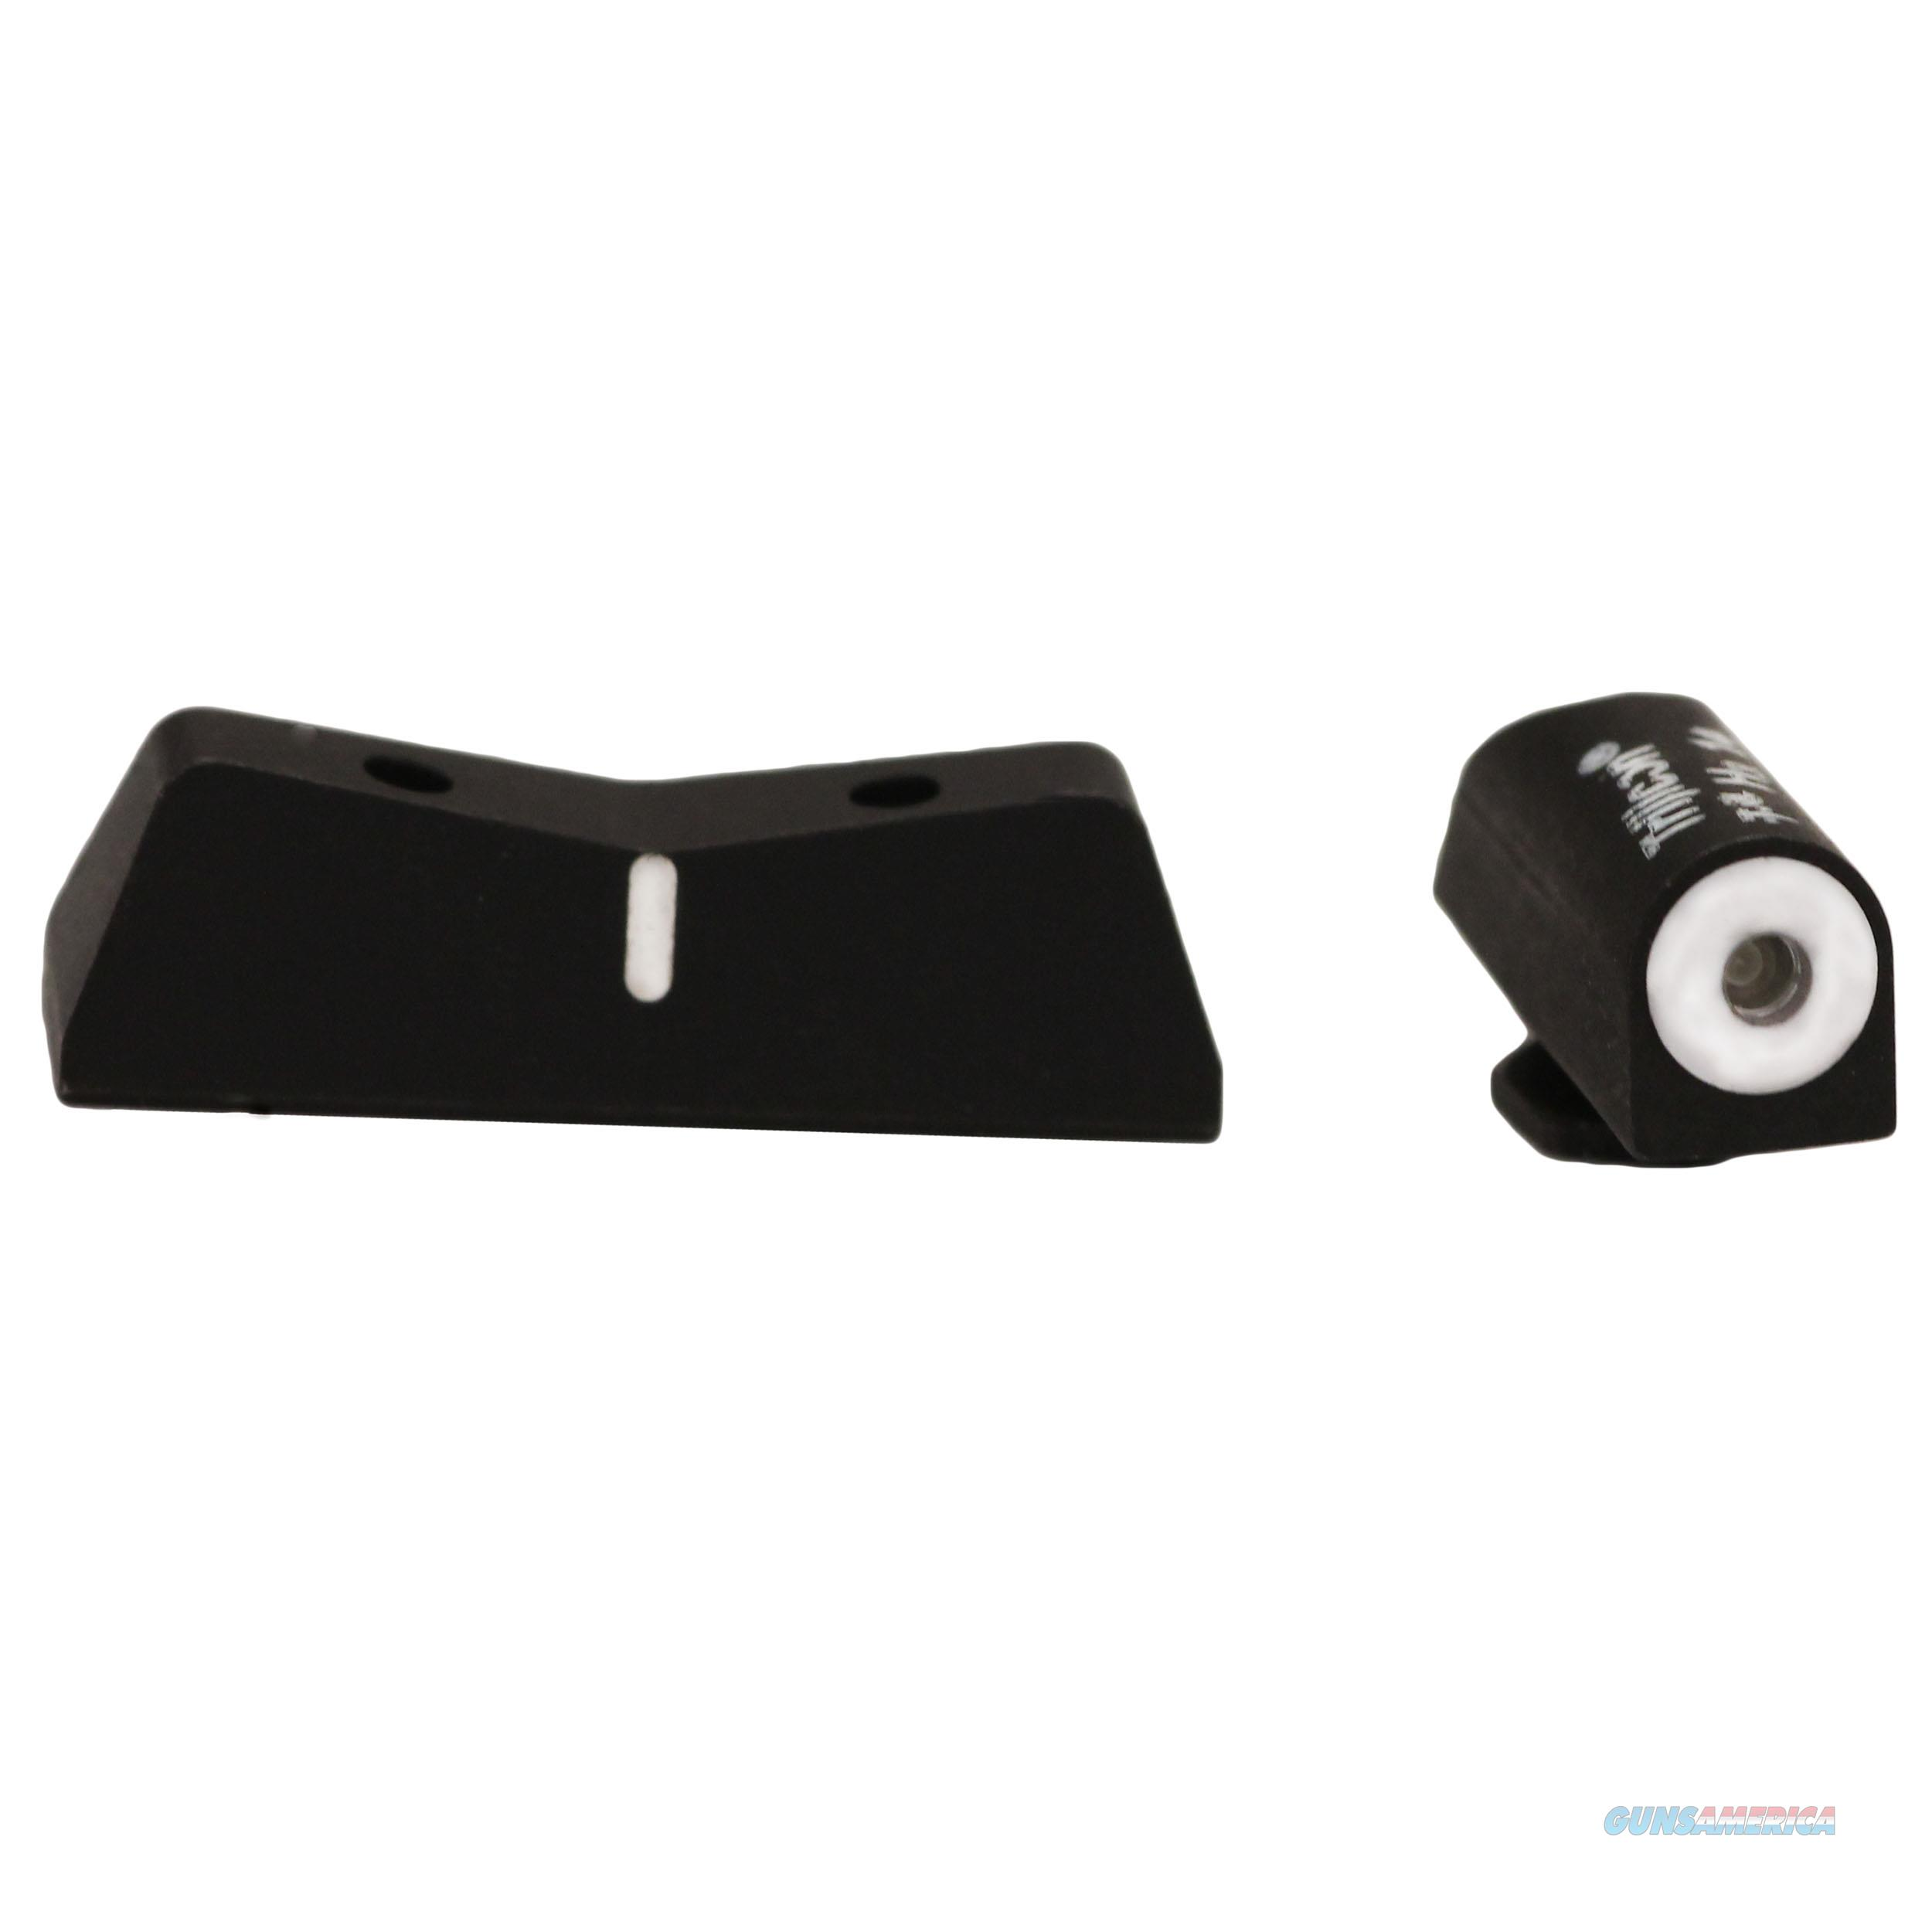 Xs Sights Dxw Big Dot GL-0001S-3  Non-Guns > Iron/Metal/Peep Sights